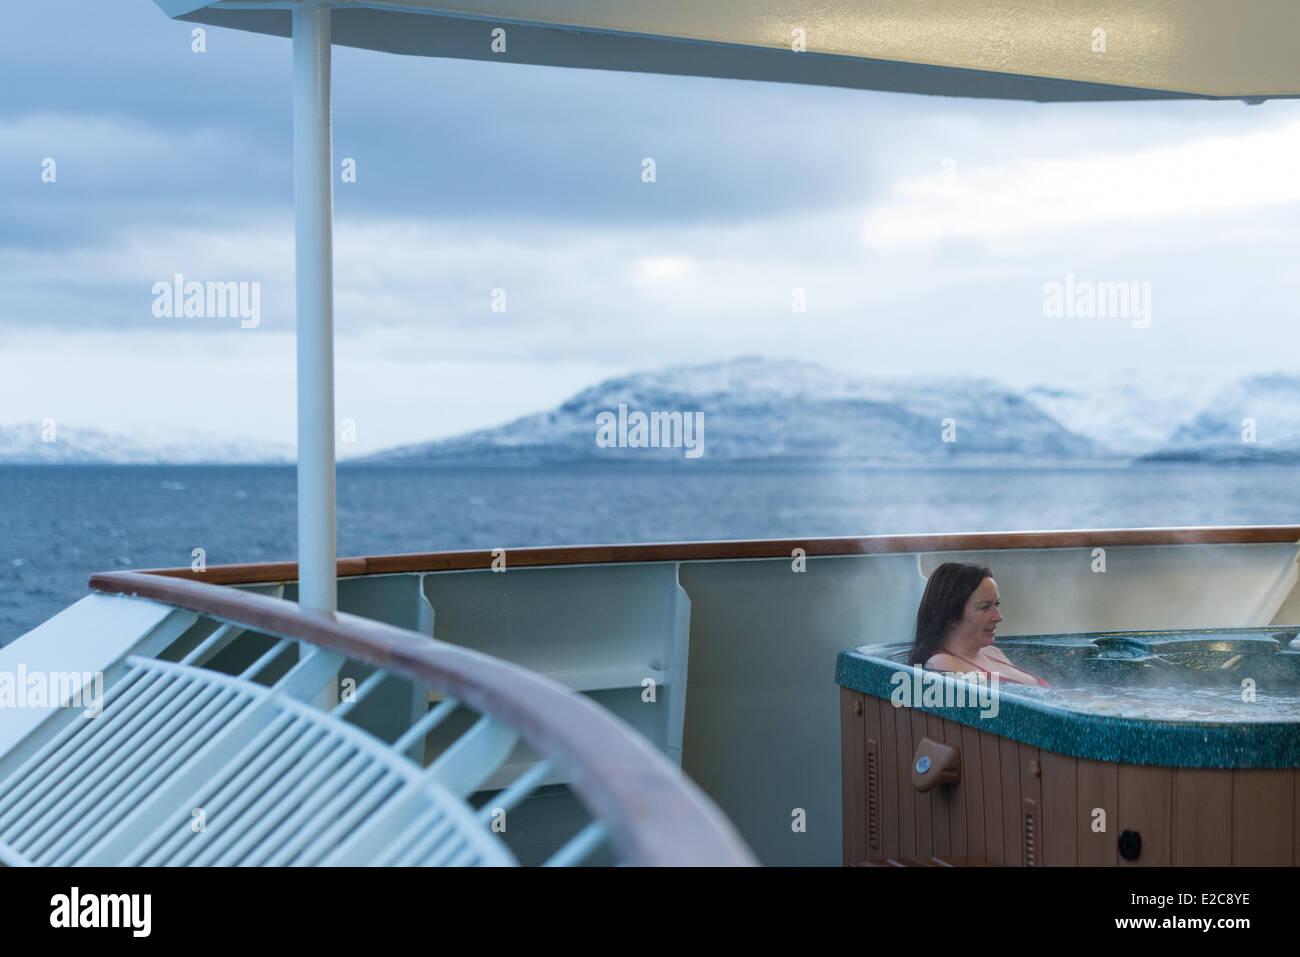 Ship Jacuzzi Stock Photos & Ship Jacuzzi Stock Images - Alamy